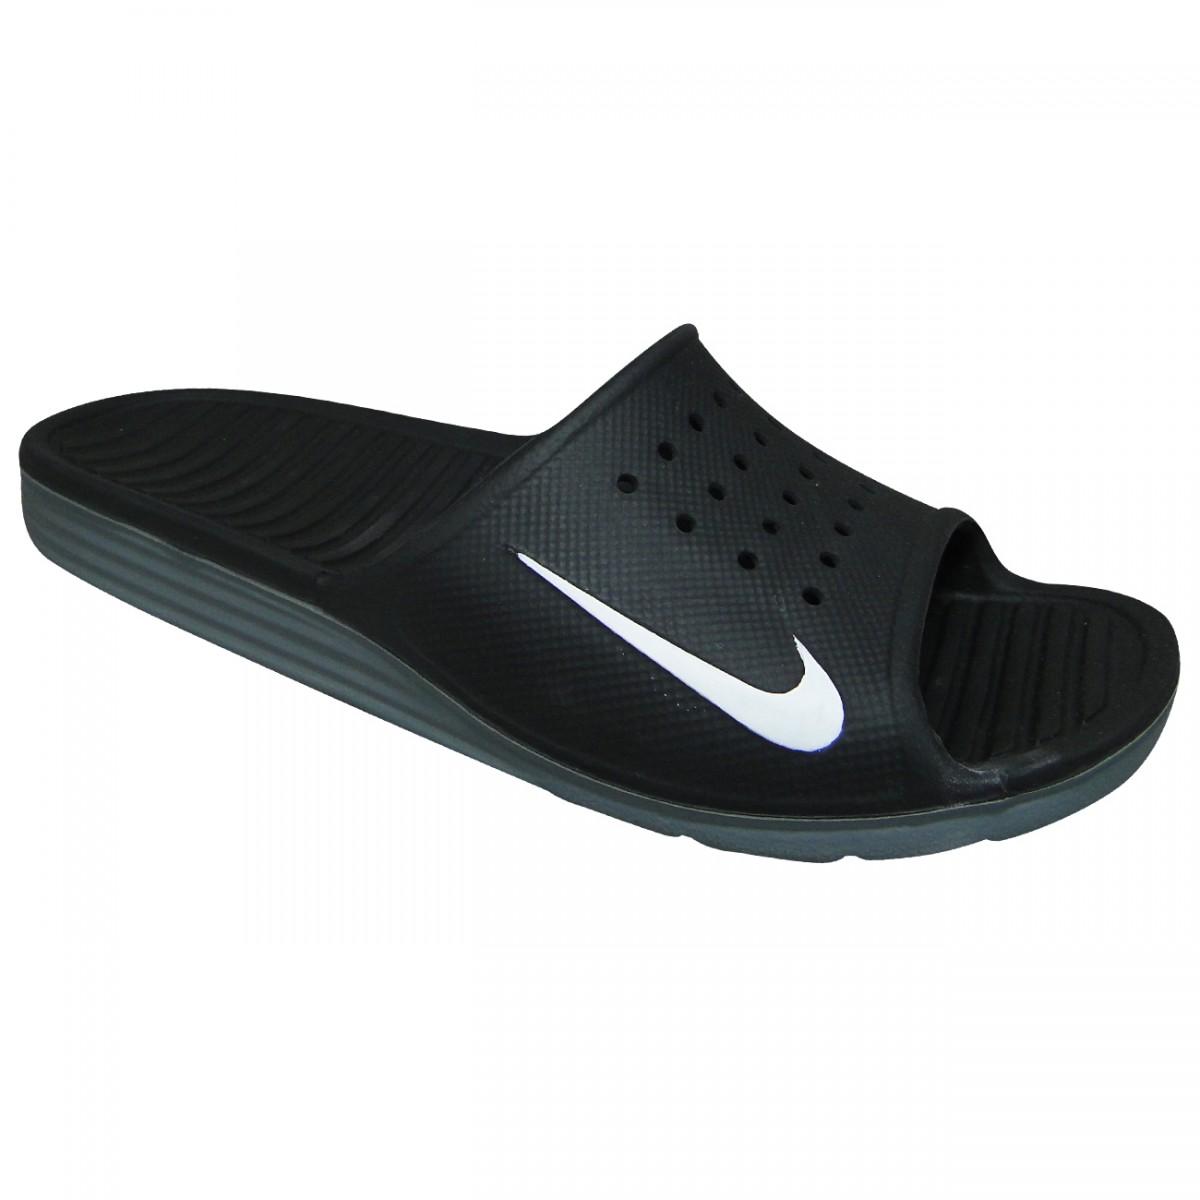 6cb4517a65 Chinelo Nike Solarsoft Slide 386163 011 - Preto/Branco - Chuteira Nike,  Adidas. Sandalias Femininas. Sandy Calçados